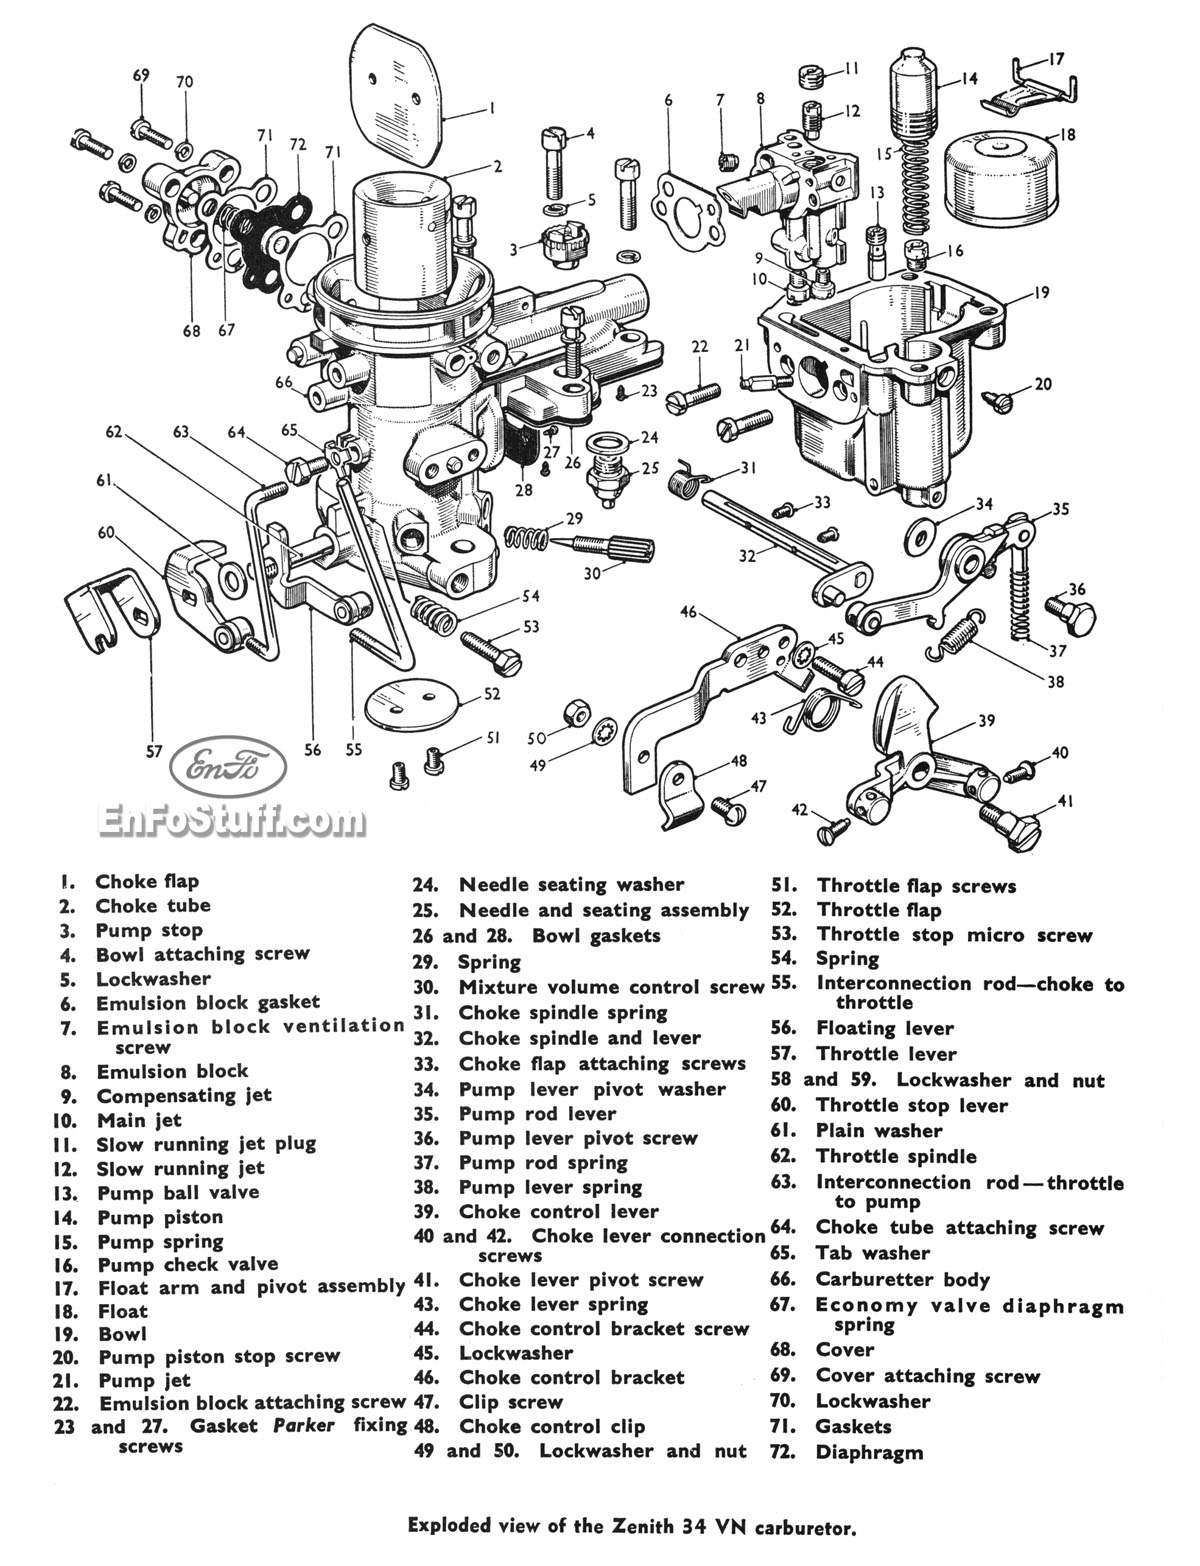 zenith carburetor diagram